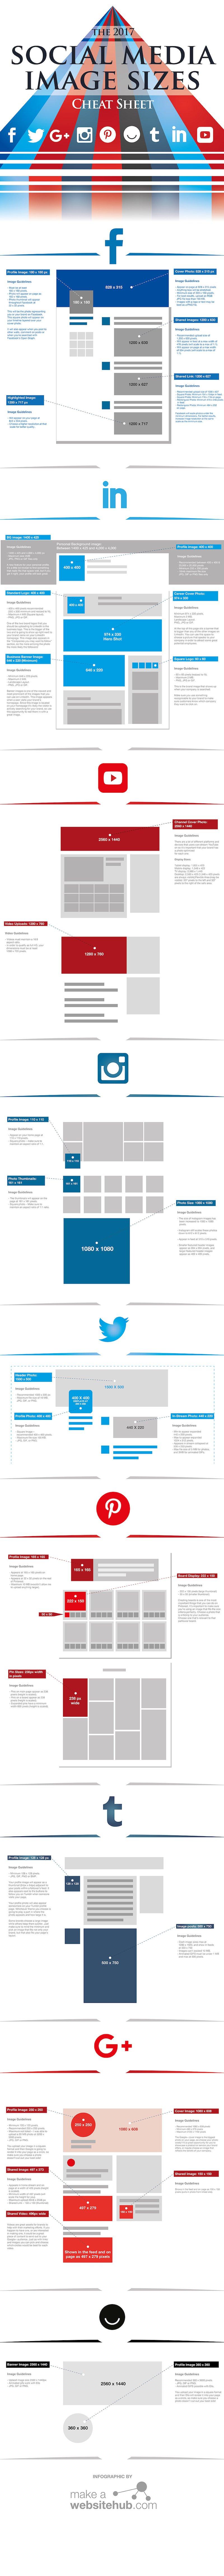 1-social-media-cheat-sheet-infografia